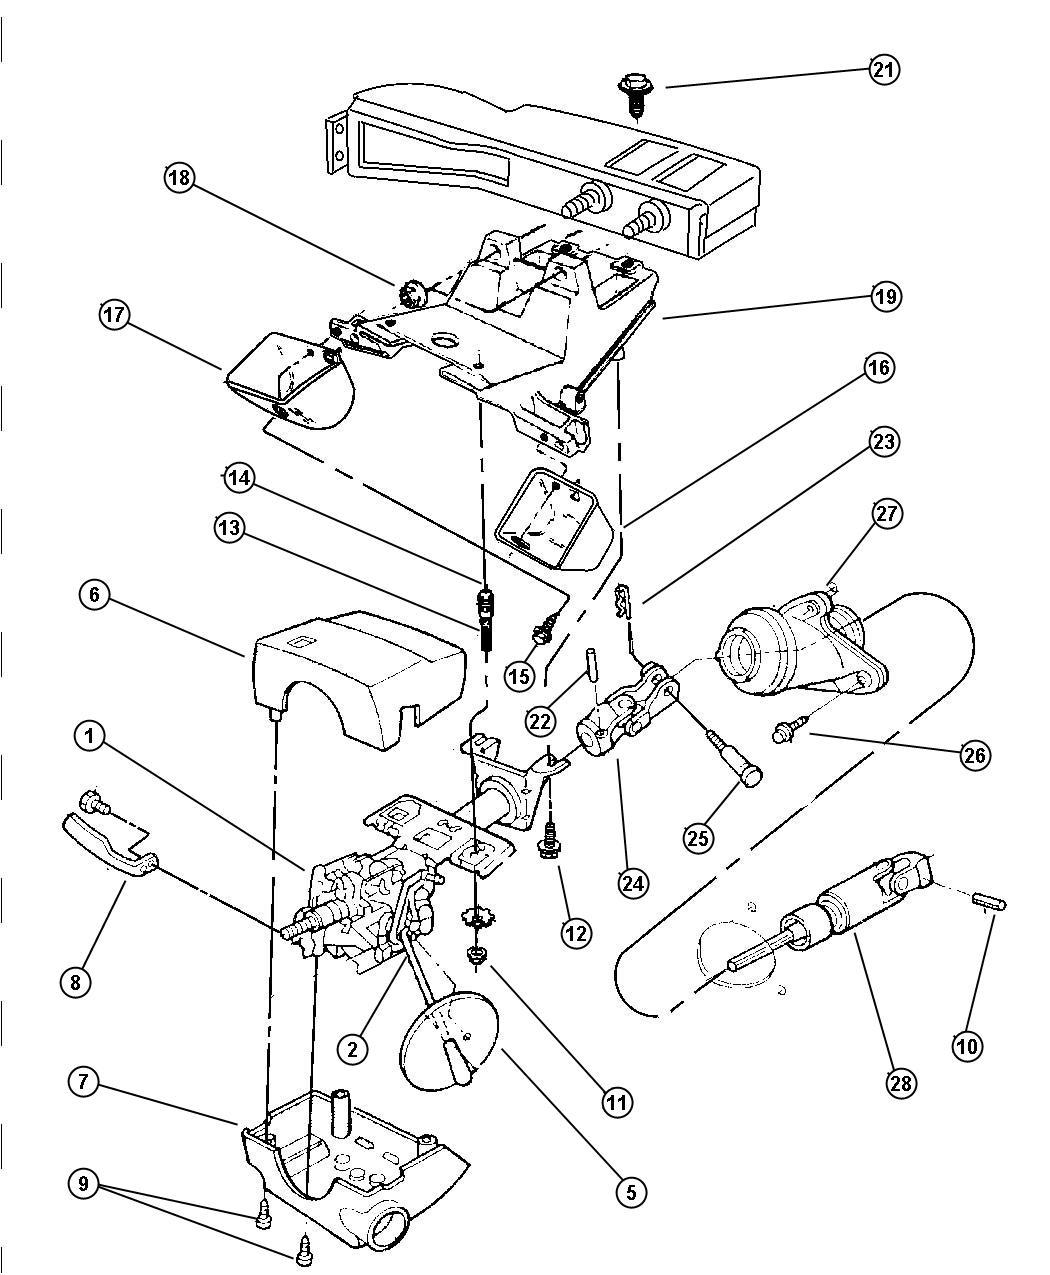 Chrysler Concorde Pin Spring M8 4x30x1 60 Export